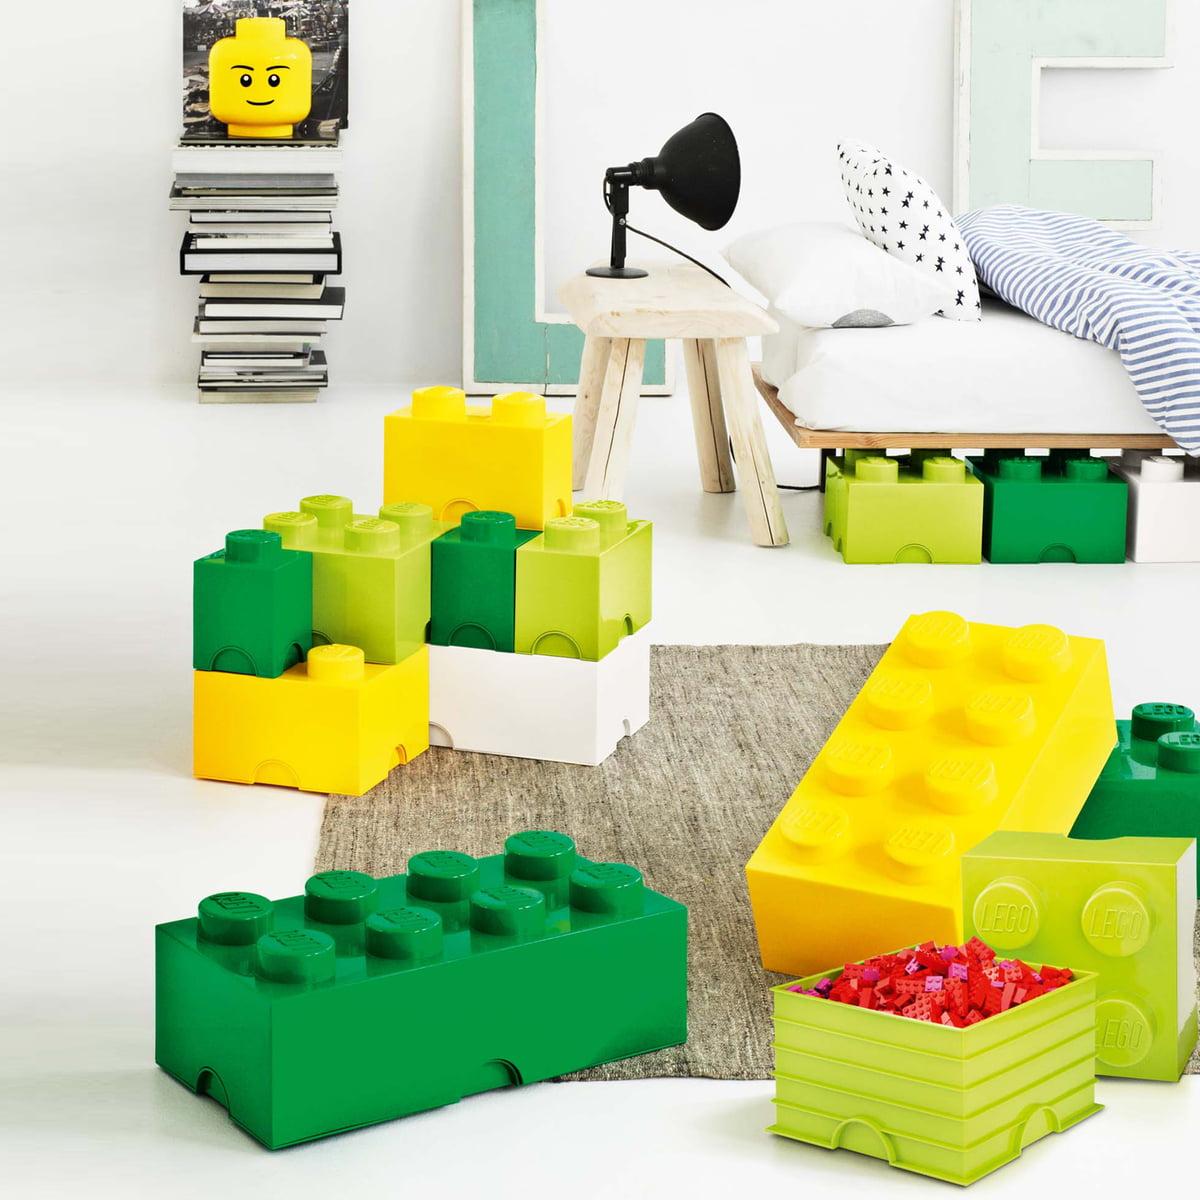 storage brick 2 by lego in the home design shop. Black Bedroom Furniture Sets. Home Design Ideas